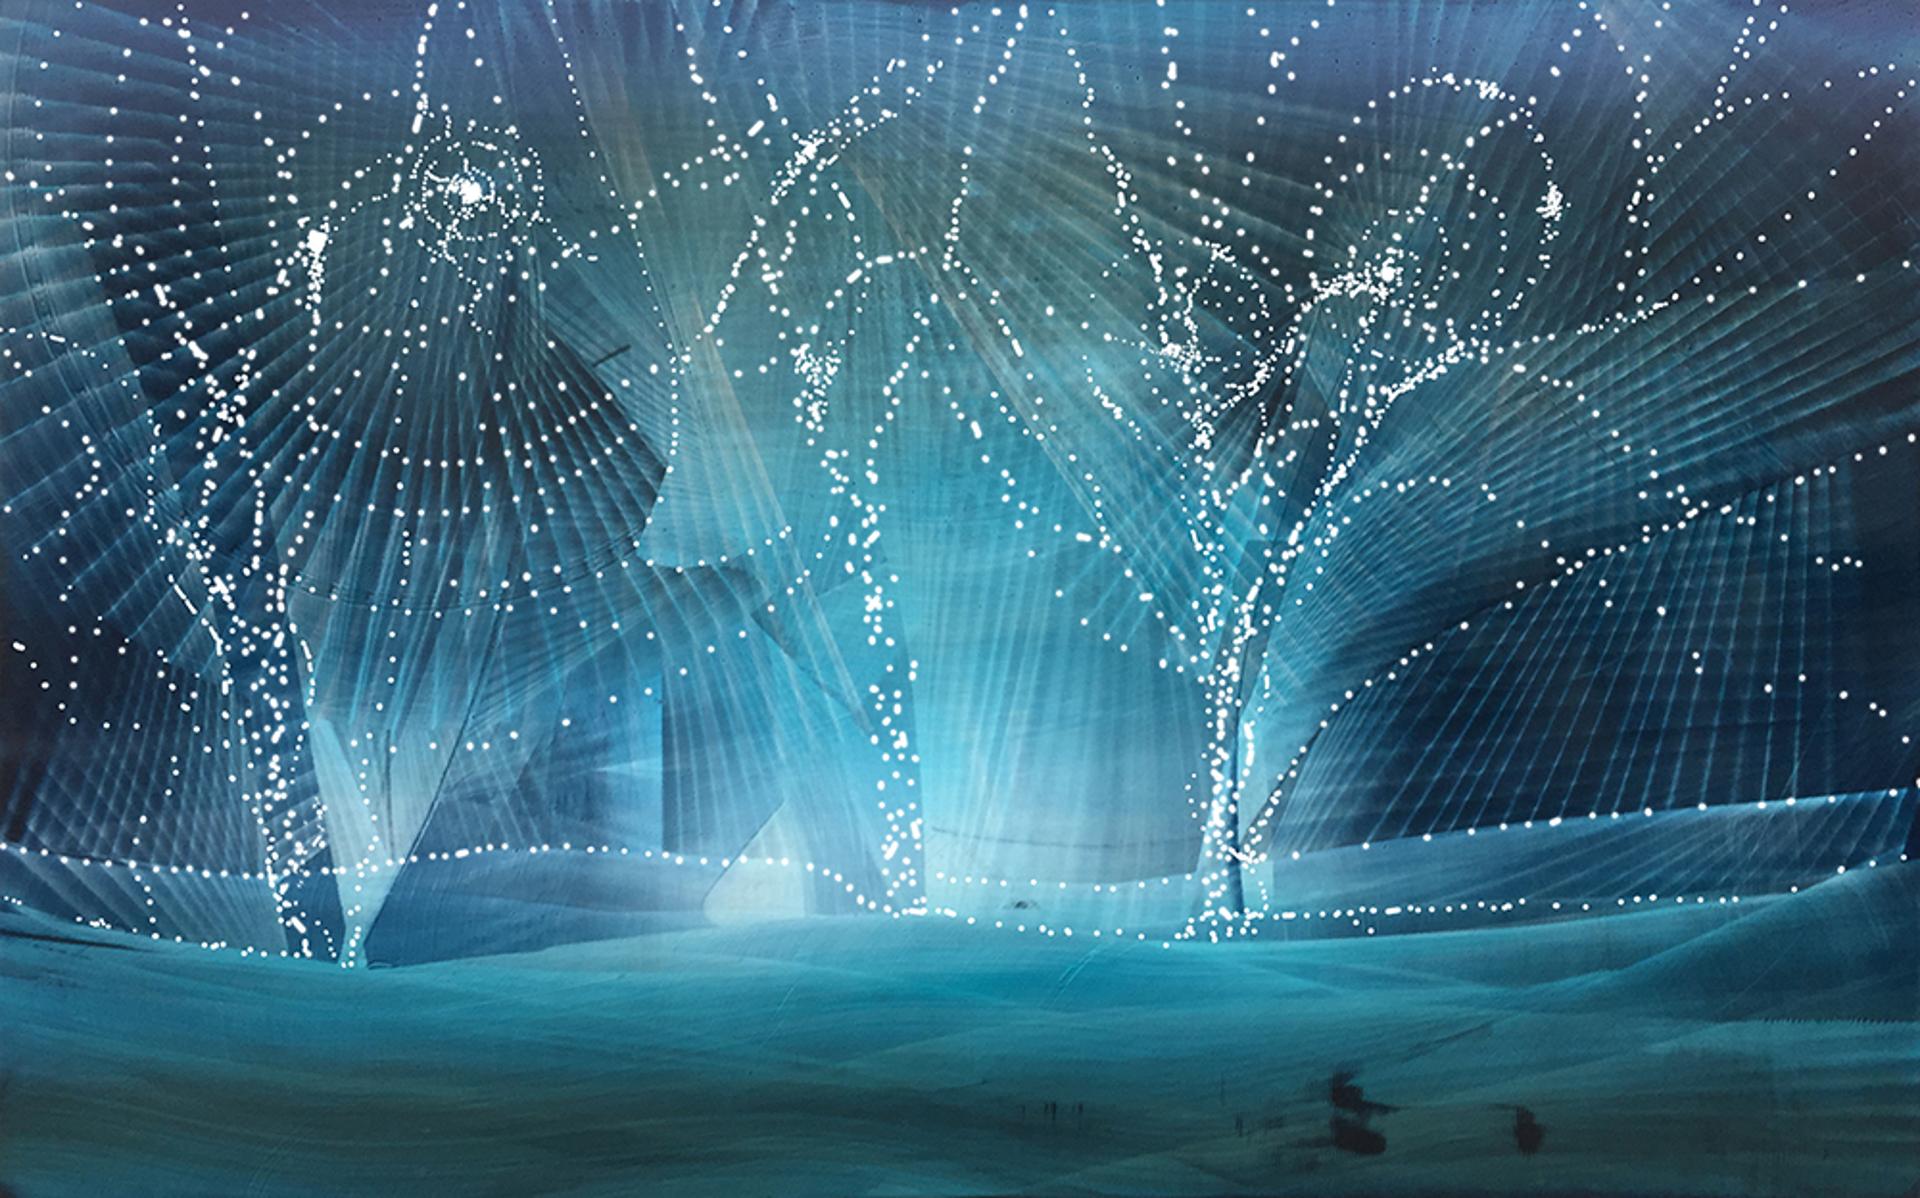 Sonorium II by Roi James